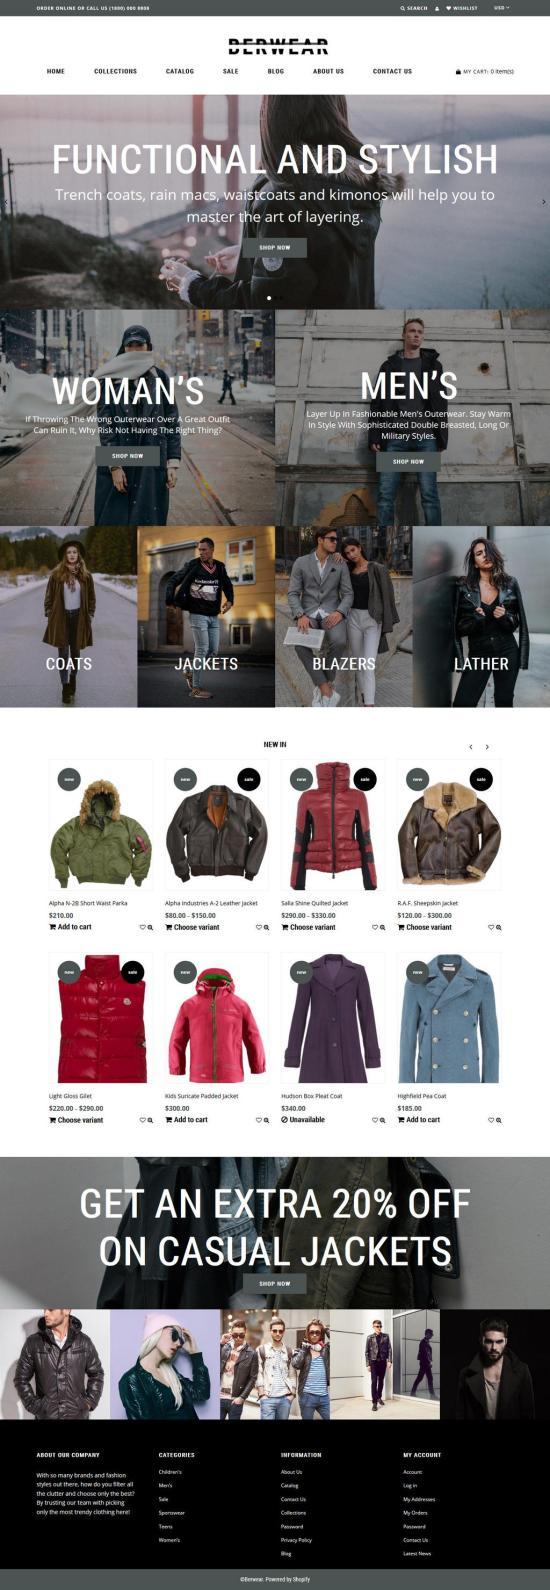 berwear shopify theme 01 - Berwear Shopify Theme